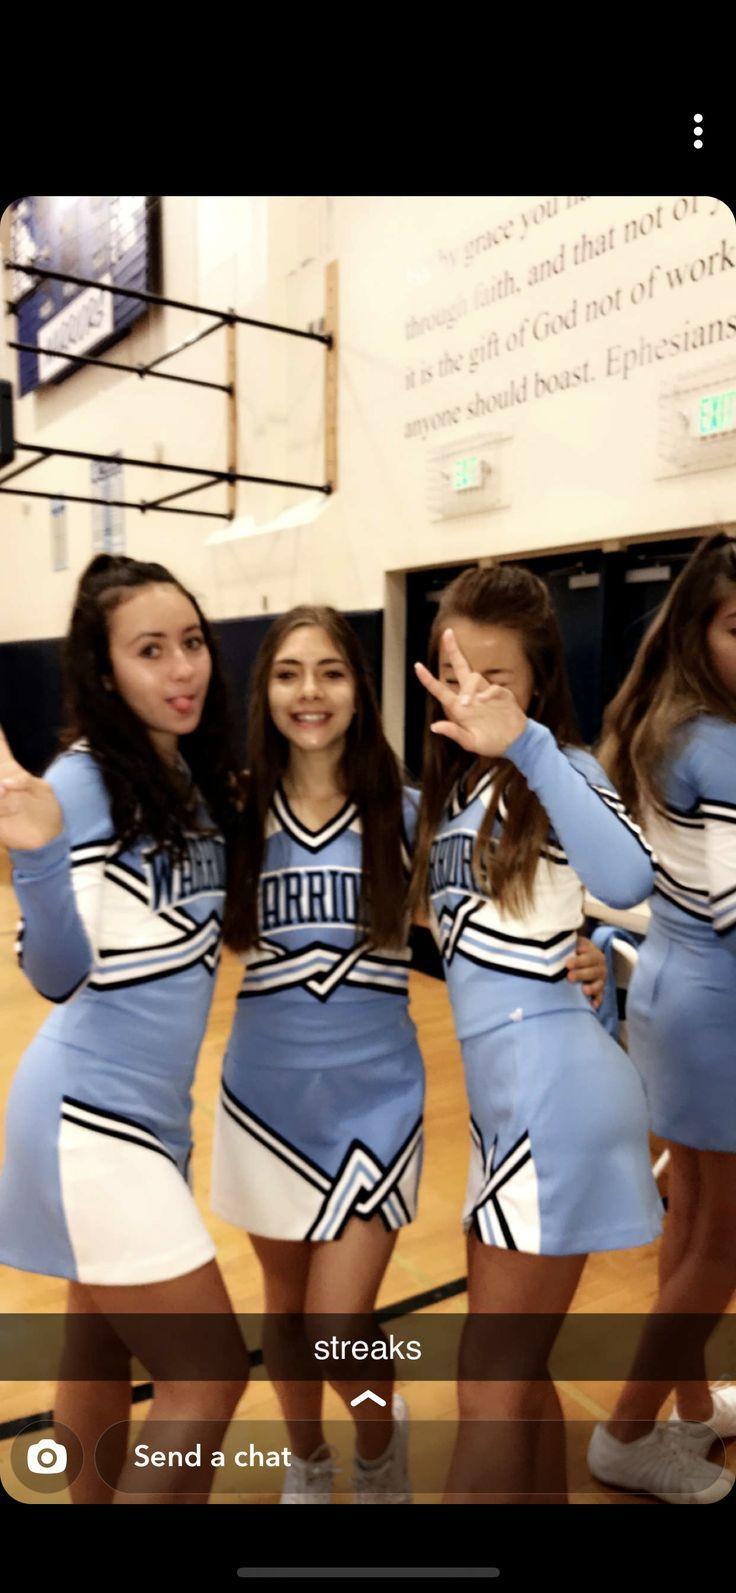 Cheer uniforms pattern cheerleading in 2020 cheer